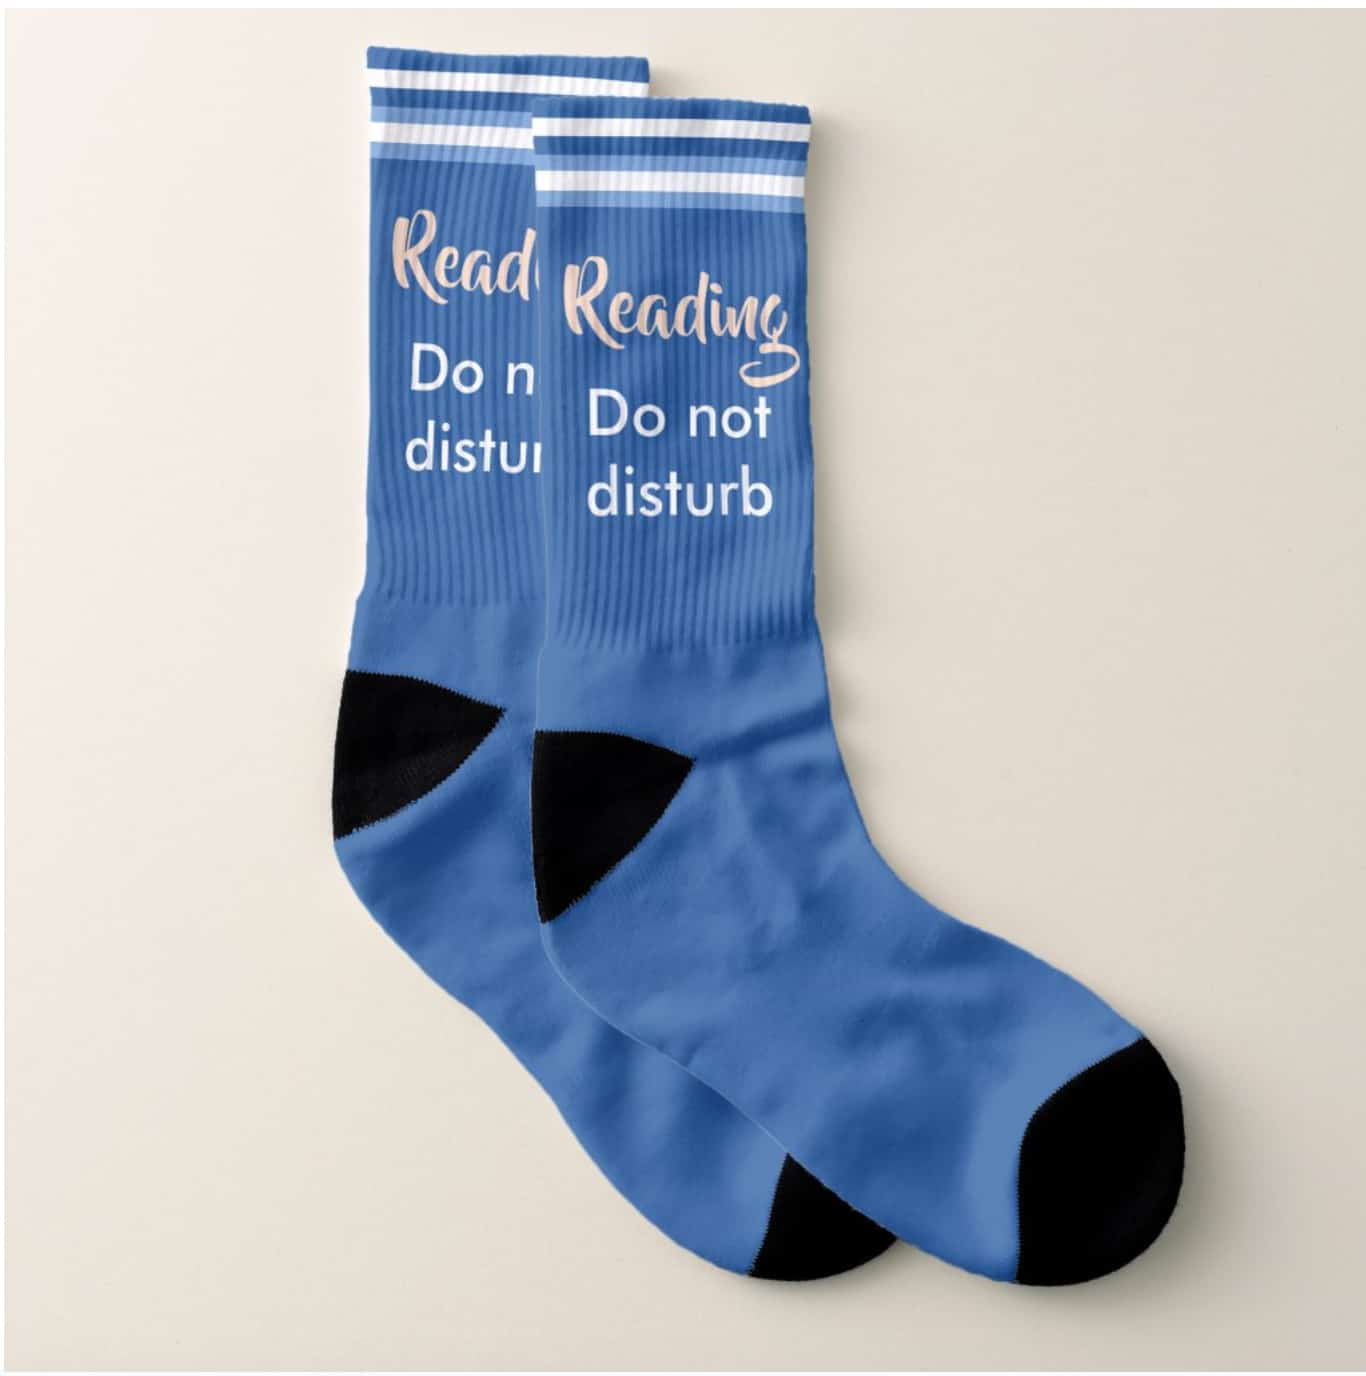 reading do not disturb socks